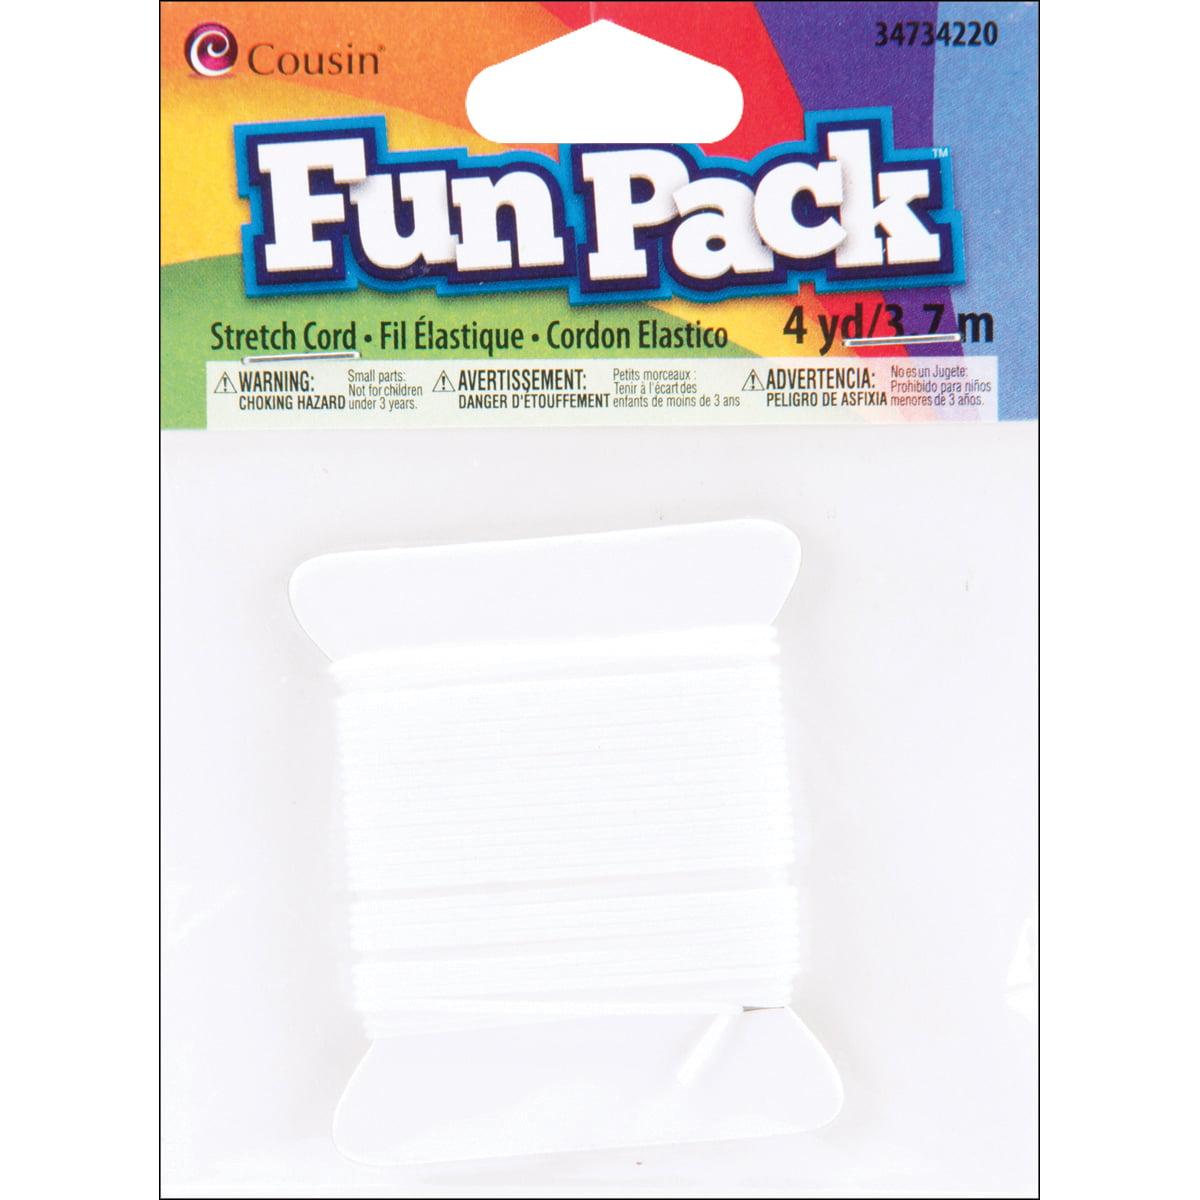 Cousin Fun Pack Stretch Cord, 4yd